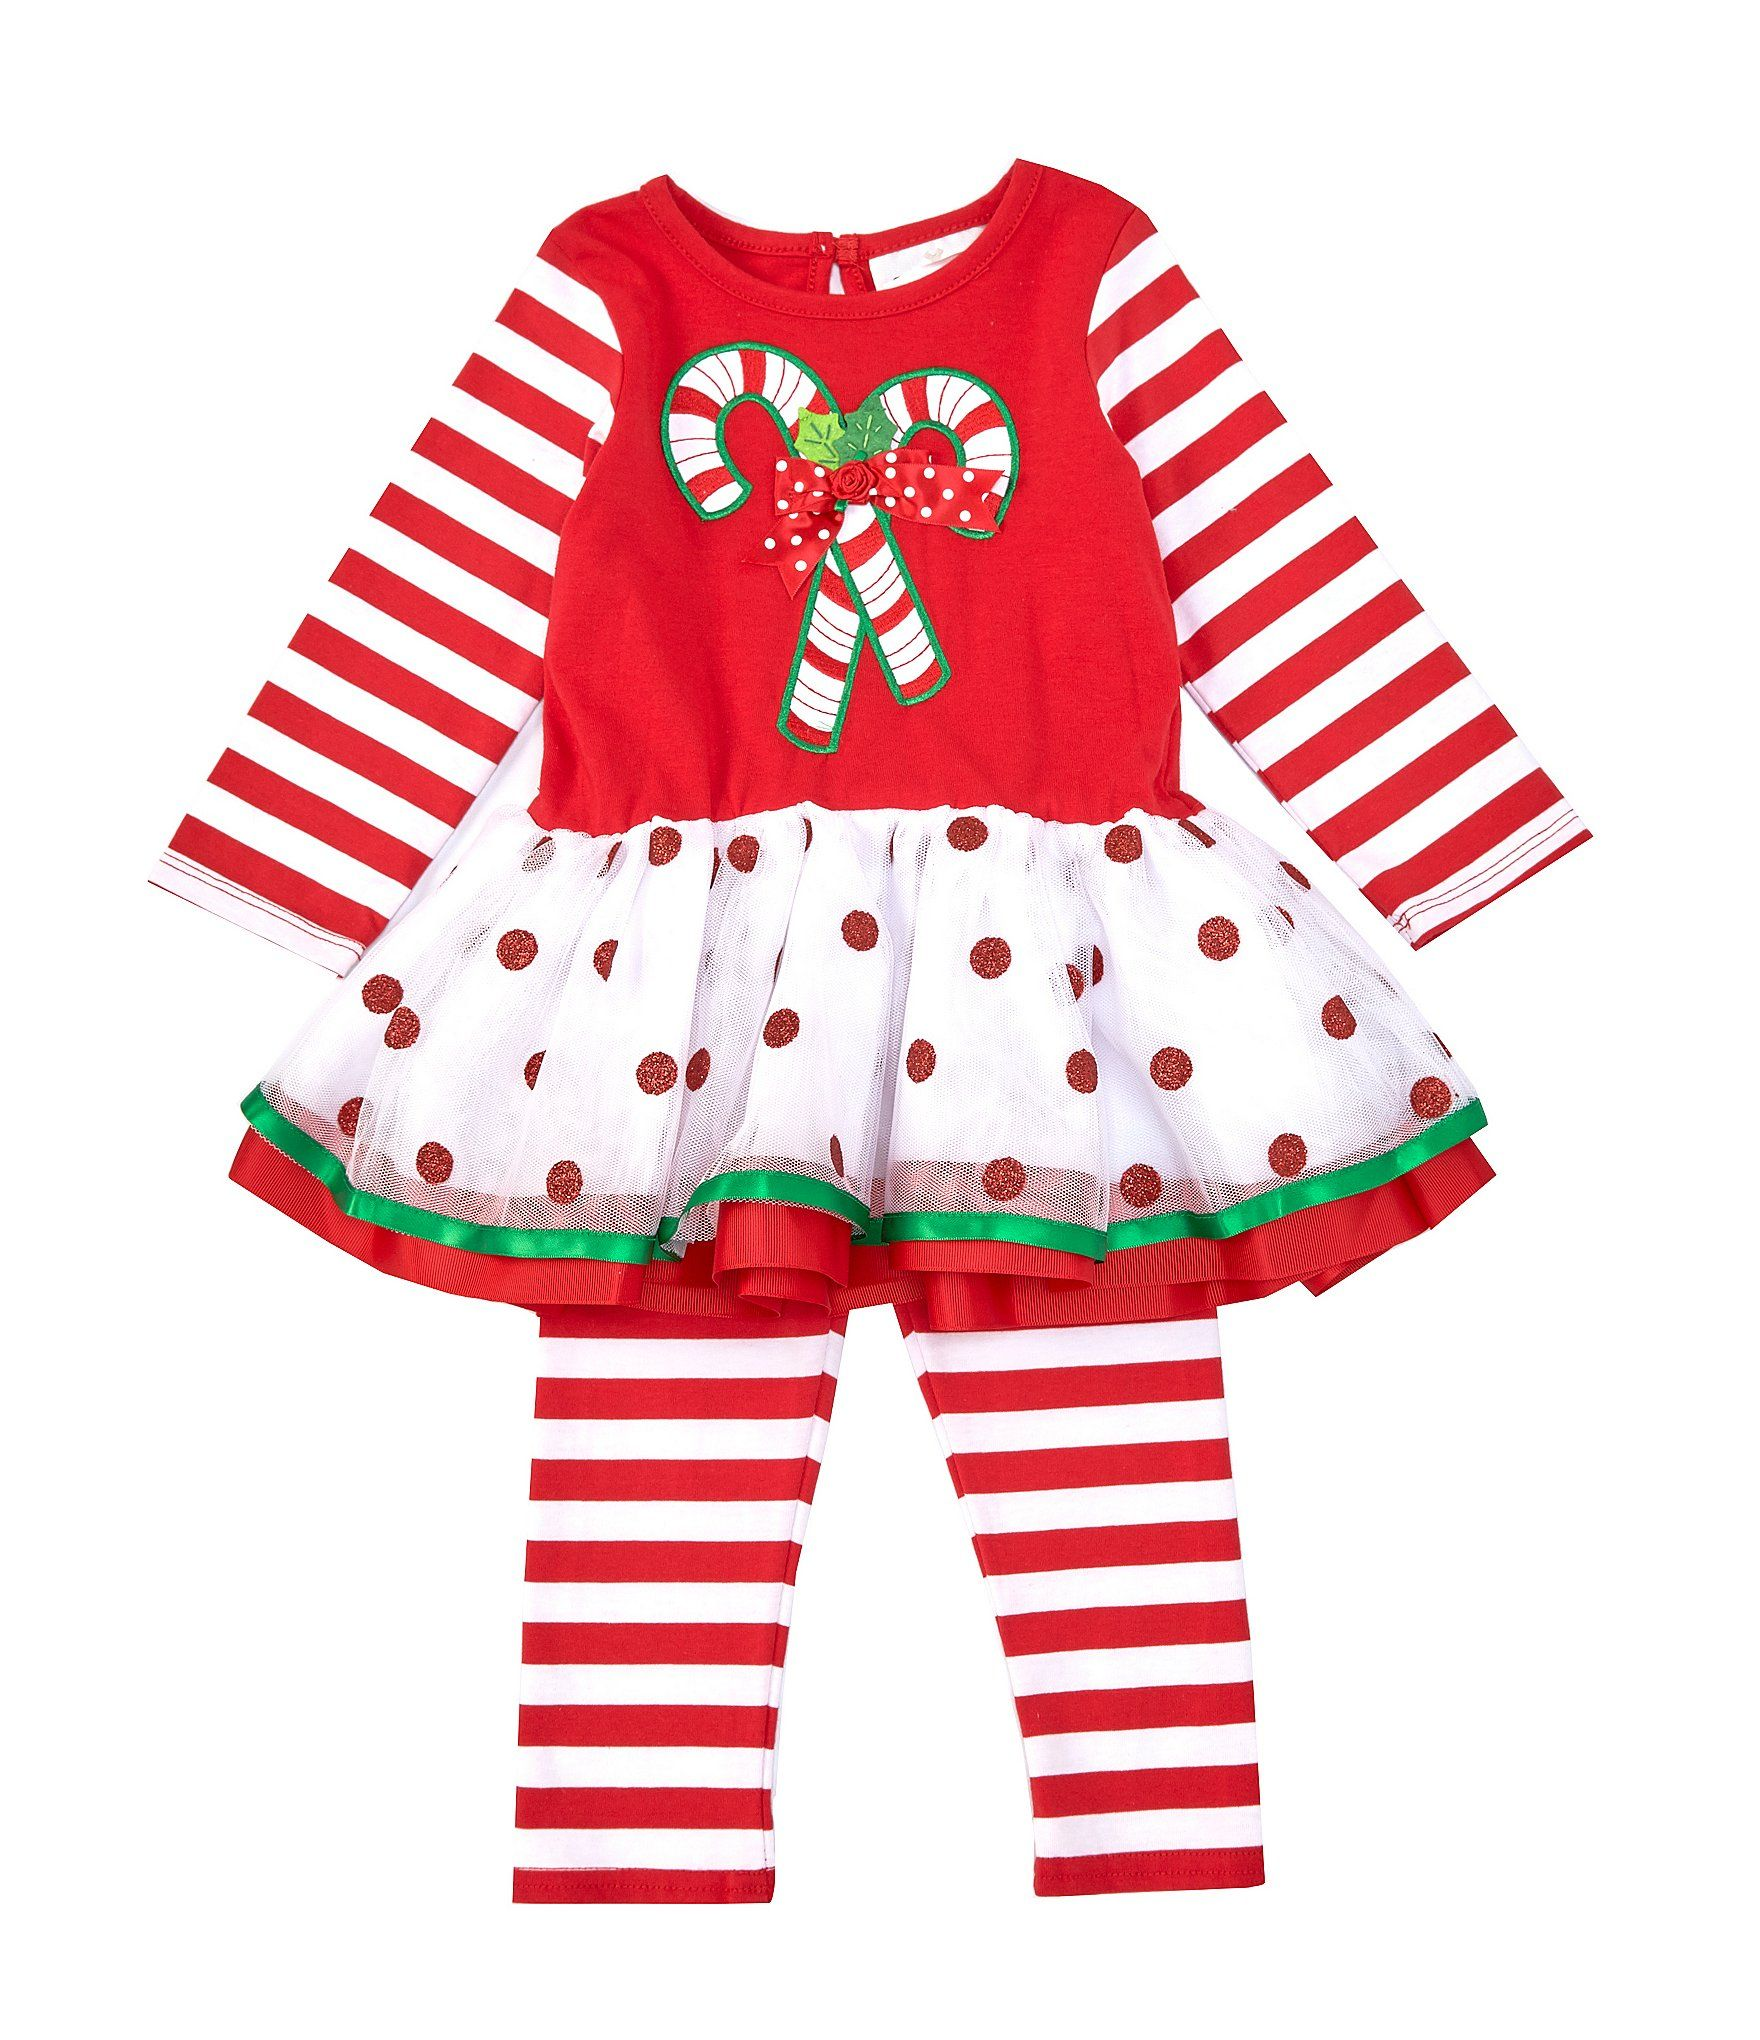 Rare Editions Baby Girls 12-24 Months Christmas Candy Cane Dress  Striped Leggings Set - Apple Green 24 Months #stripedleggings